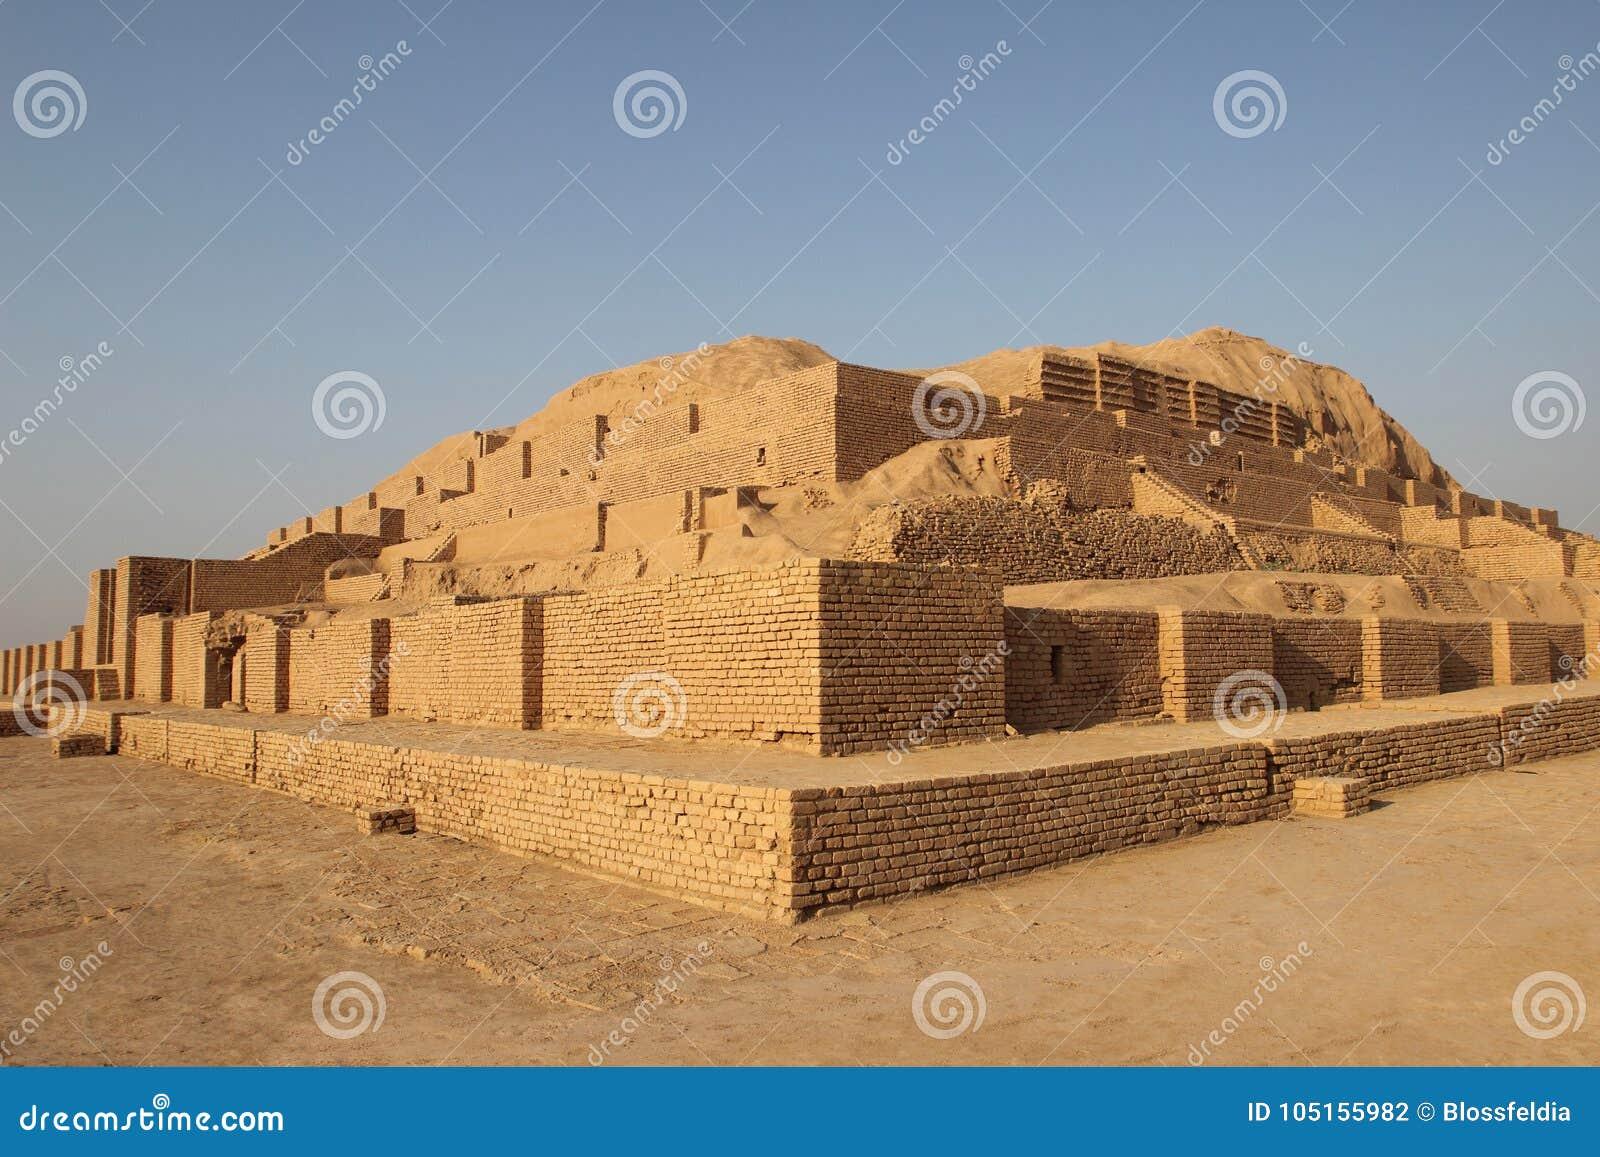 The ancient ziggurat Chogha Zanbil, Iran